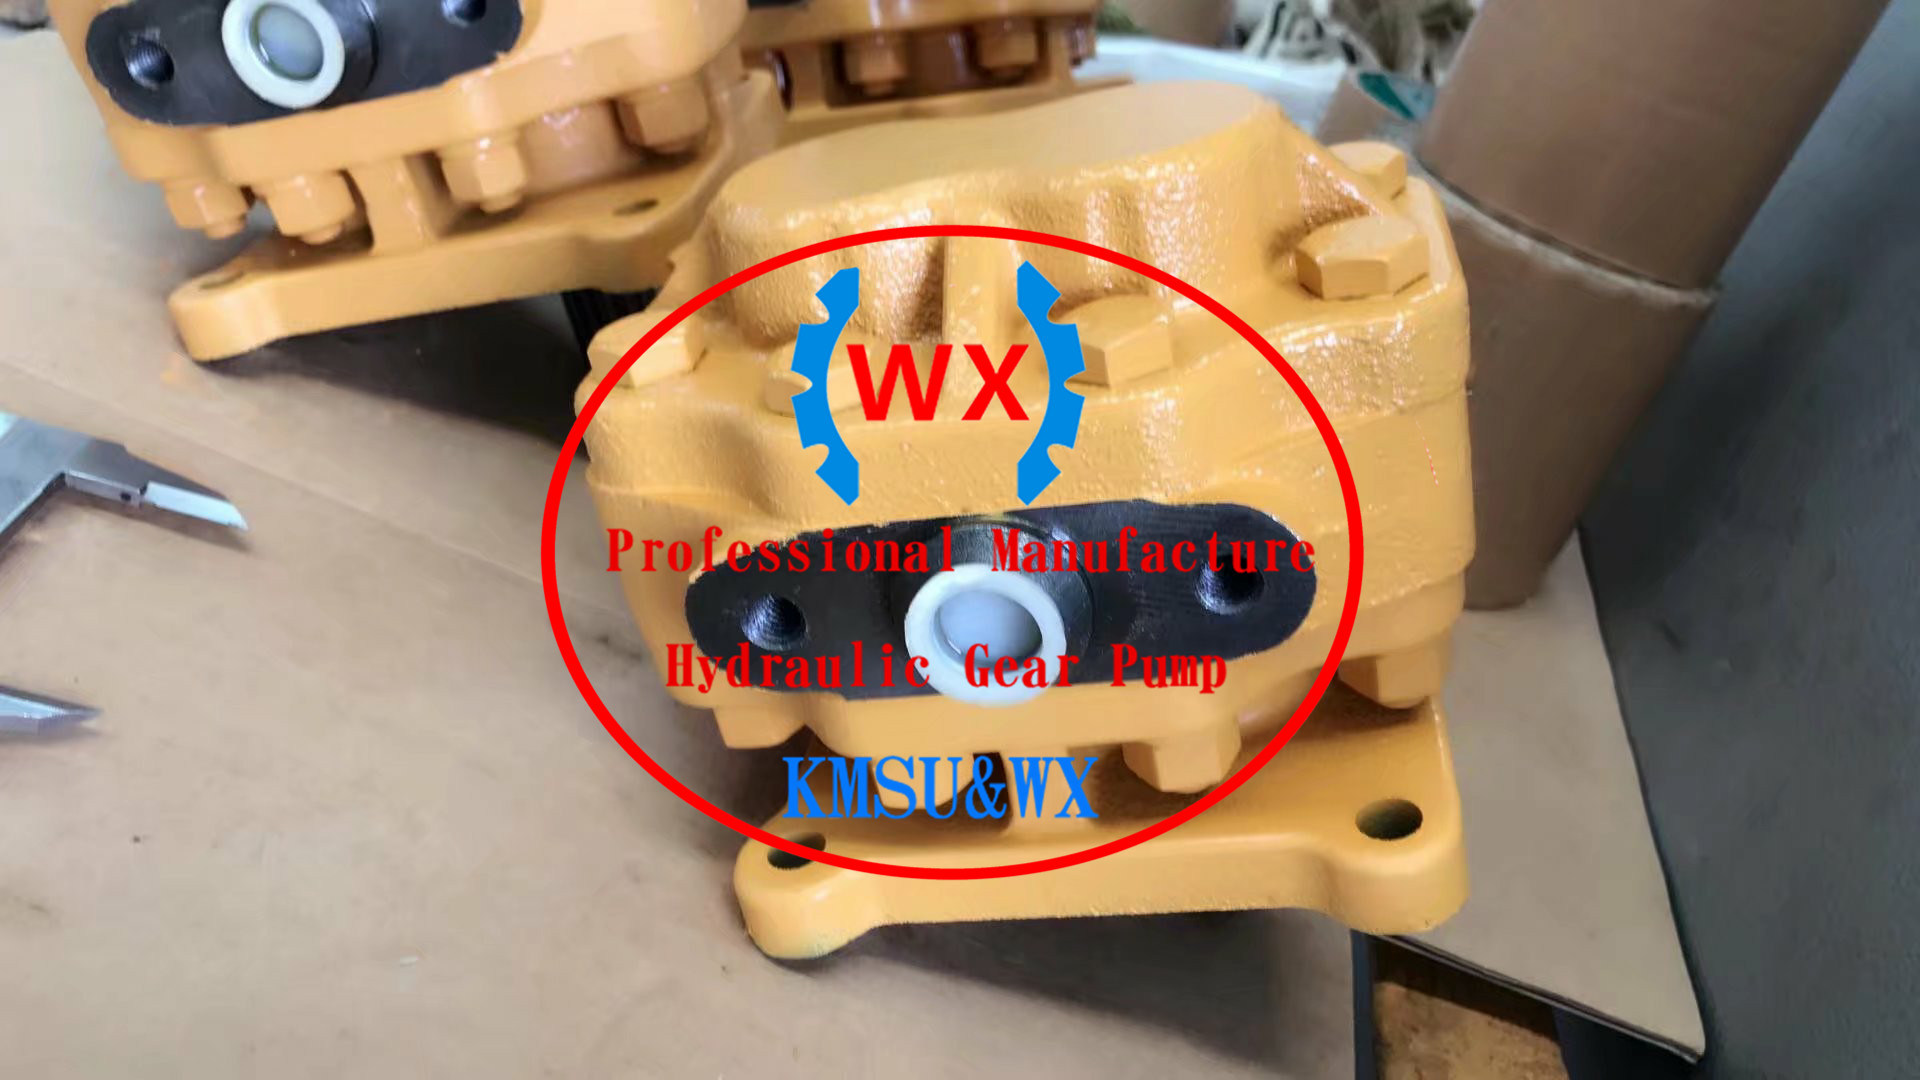 [Hot Item] Factory~Parts Number: 07441-67503 for Bulldozer Machine Model:  D65 HD460 Steering Pump for Komatsu Work Pumps Dump Trucks Gear Pump